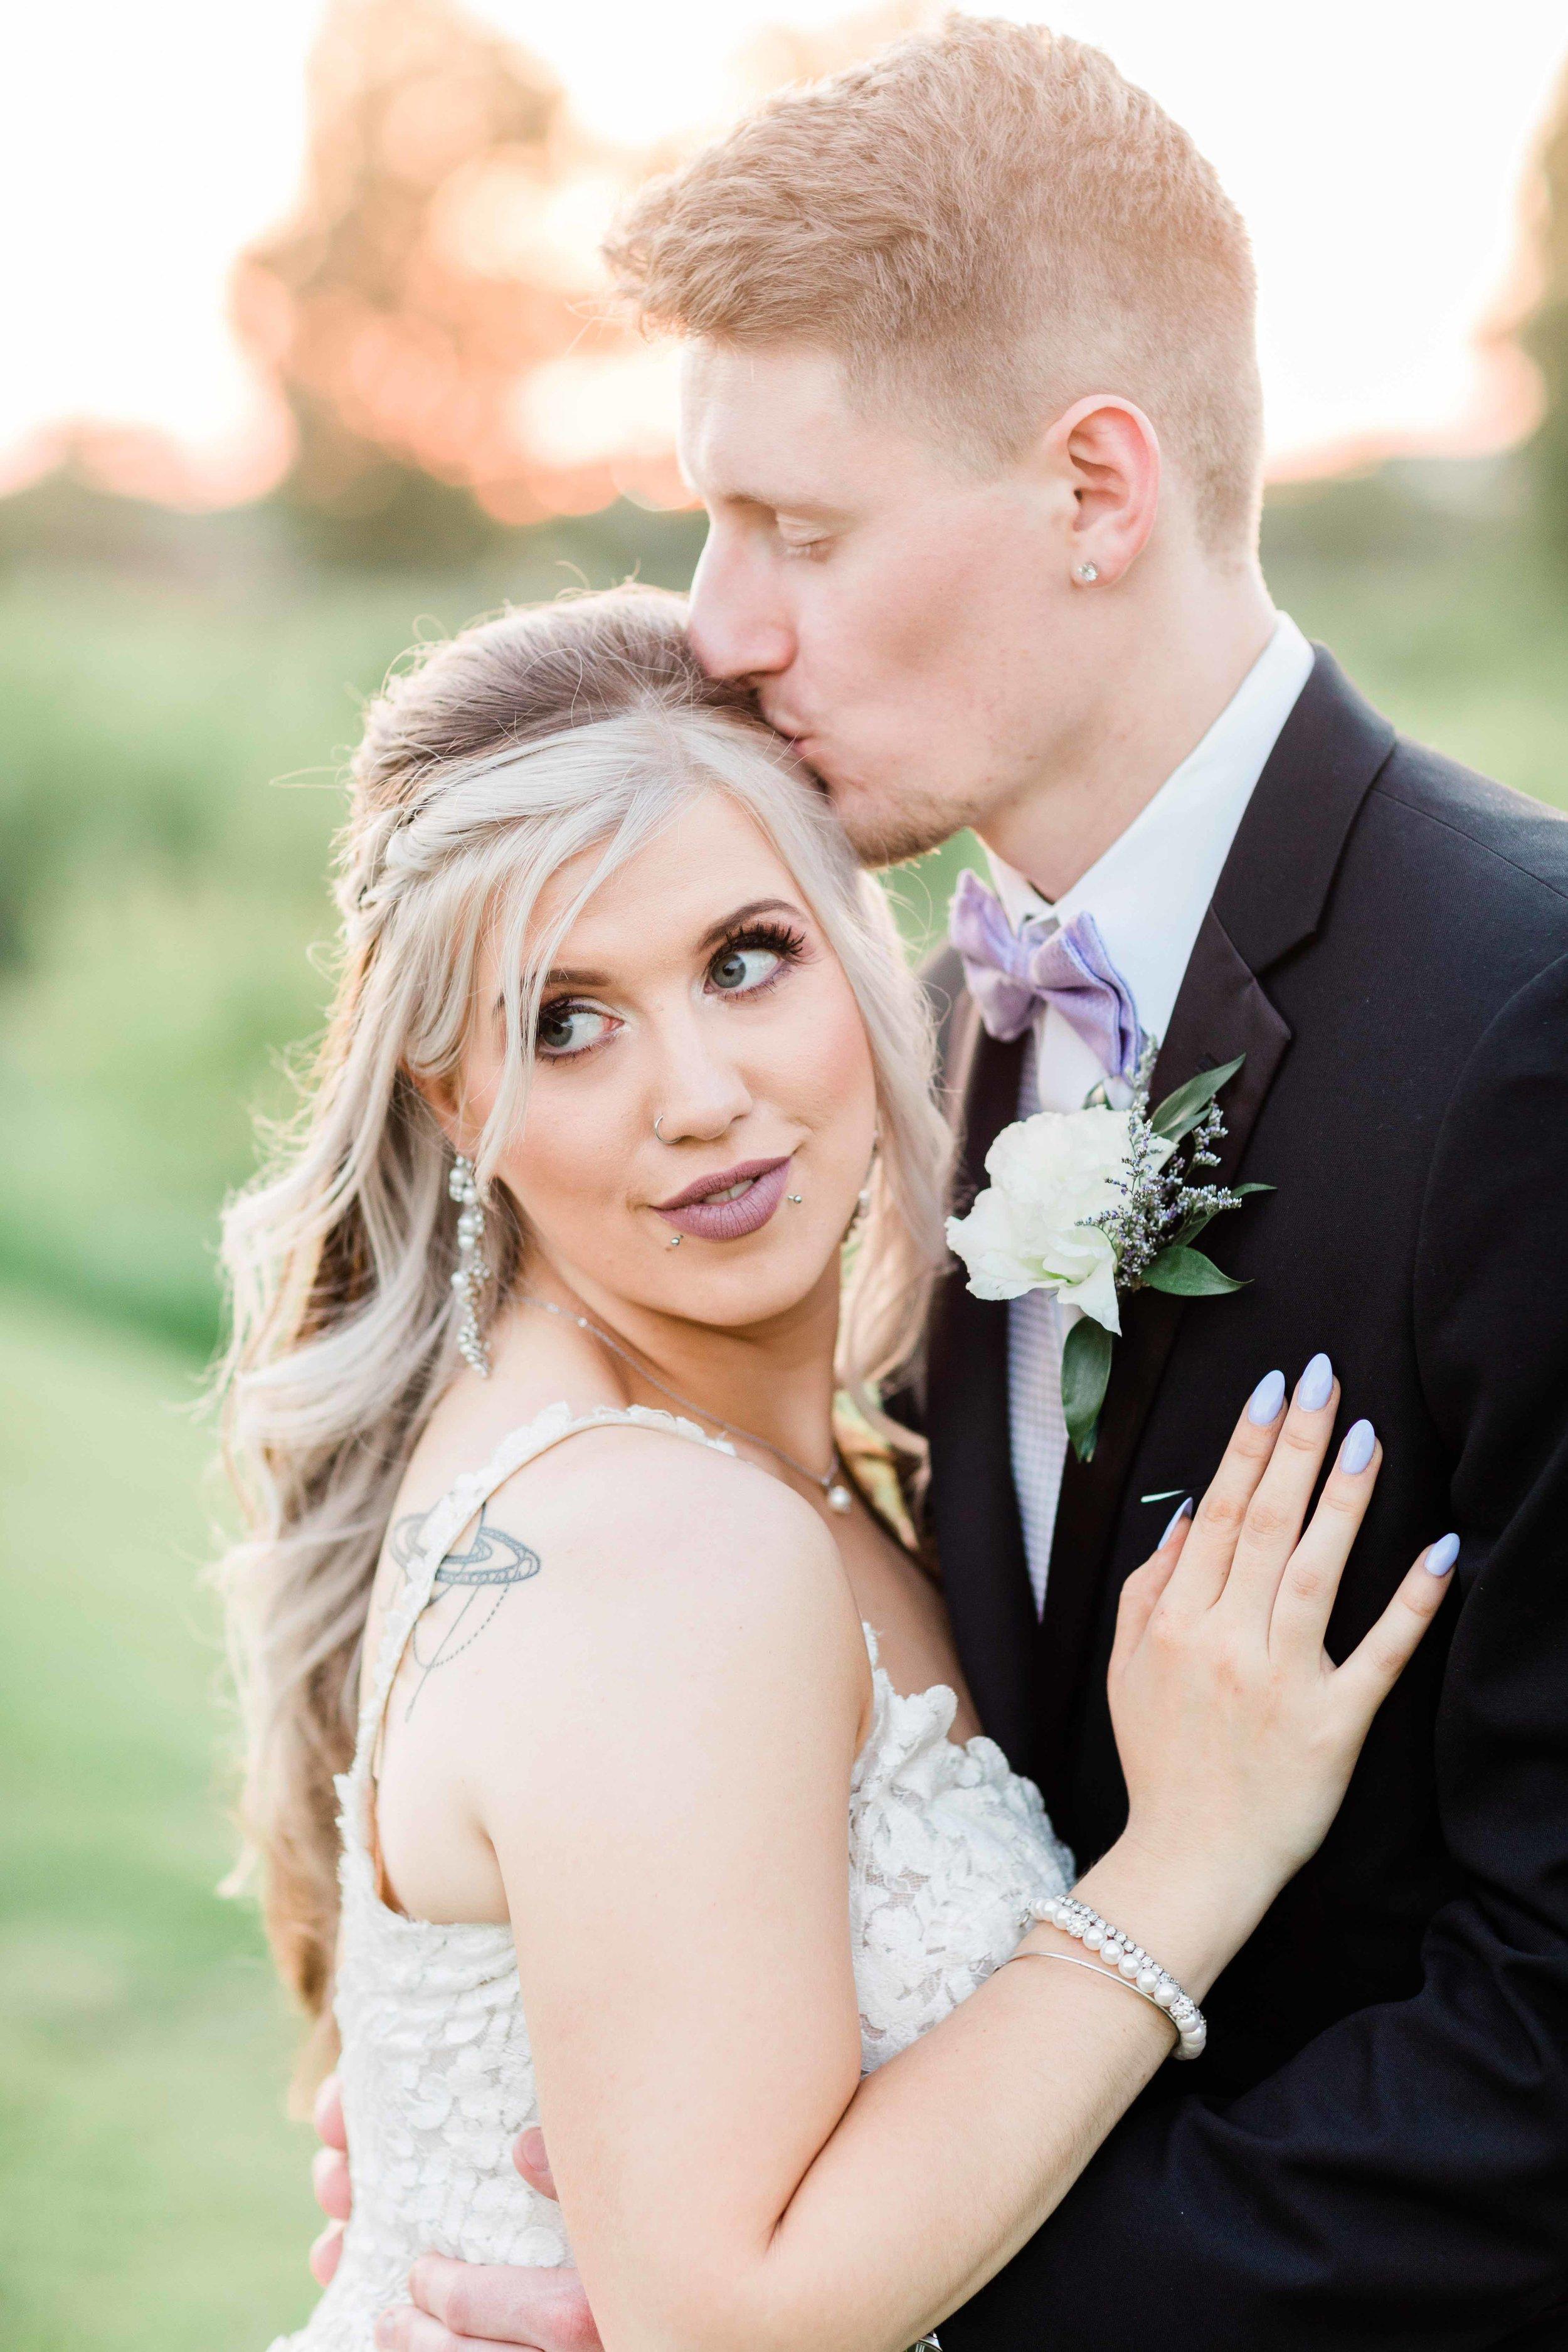 wedding photographers nky southwest ohio cincinnati dayton-6.jpg